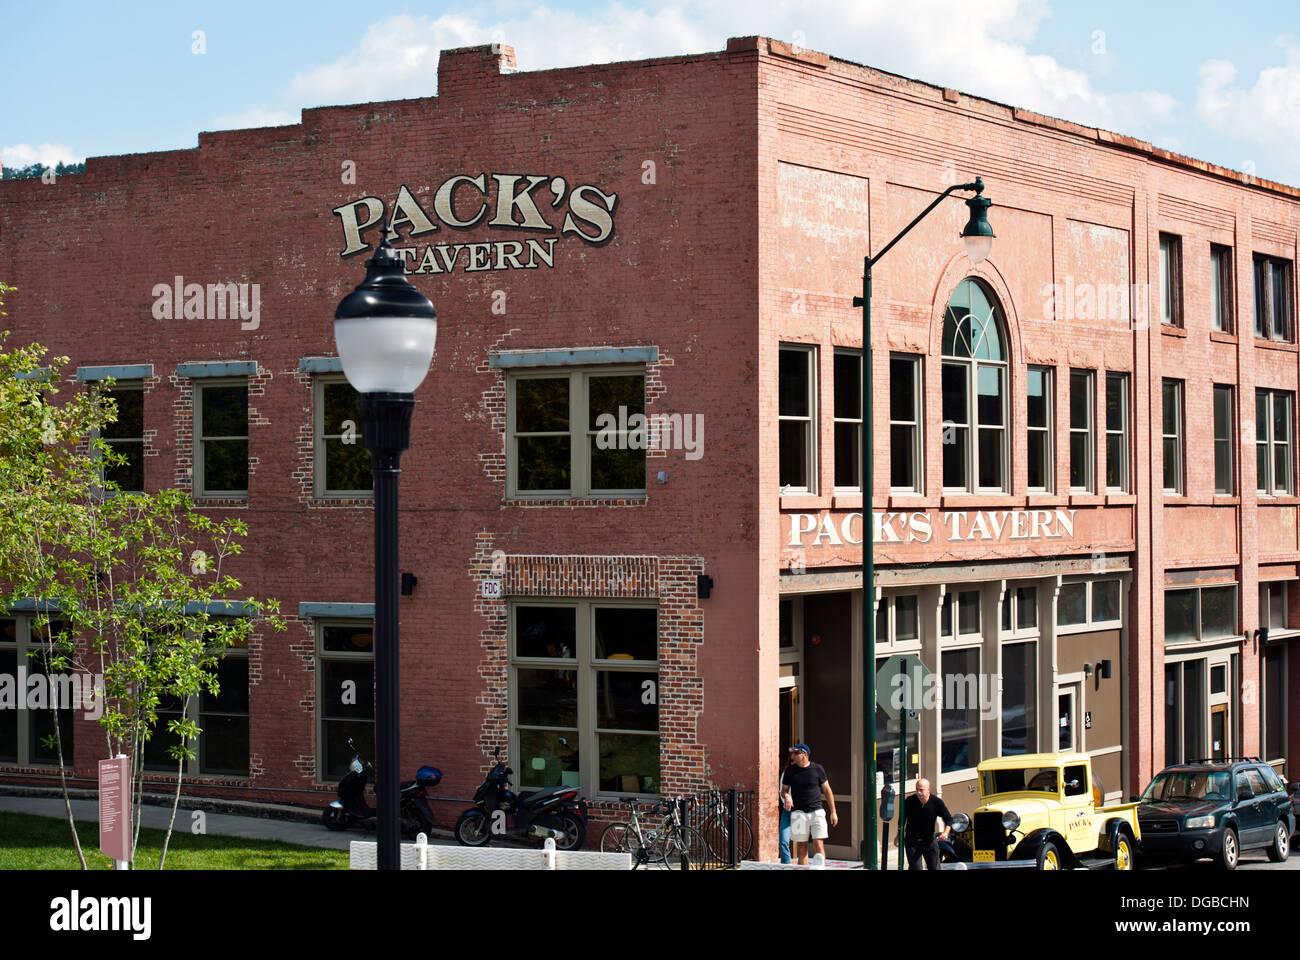 Packs Tavern in Asheville, North Carolina - Stock Image